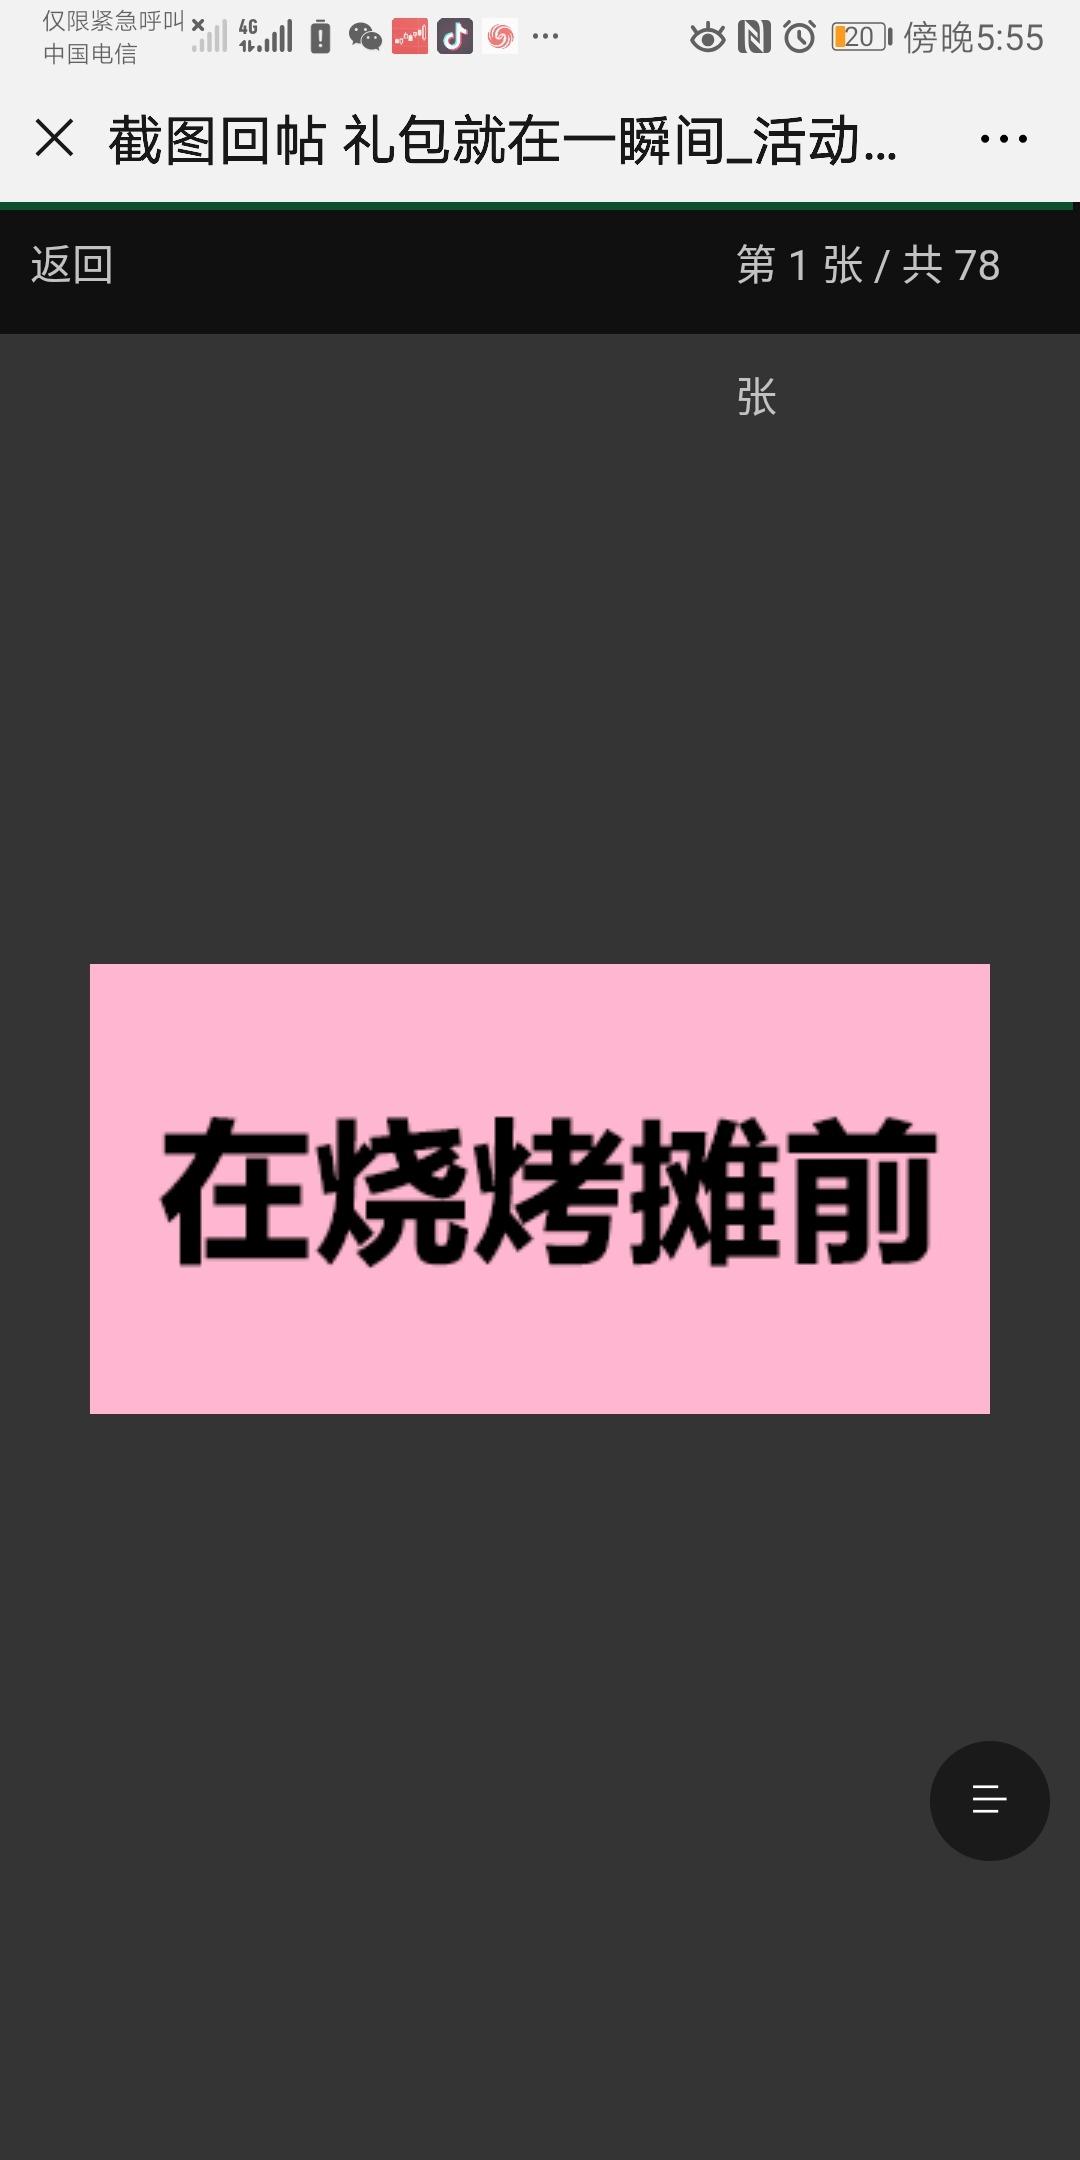 Screenshot_20190725_175552_com.tencent.mm.jpg